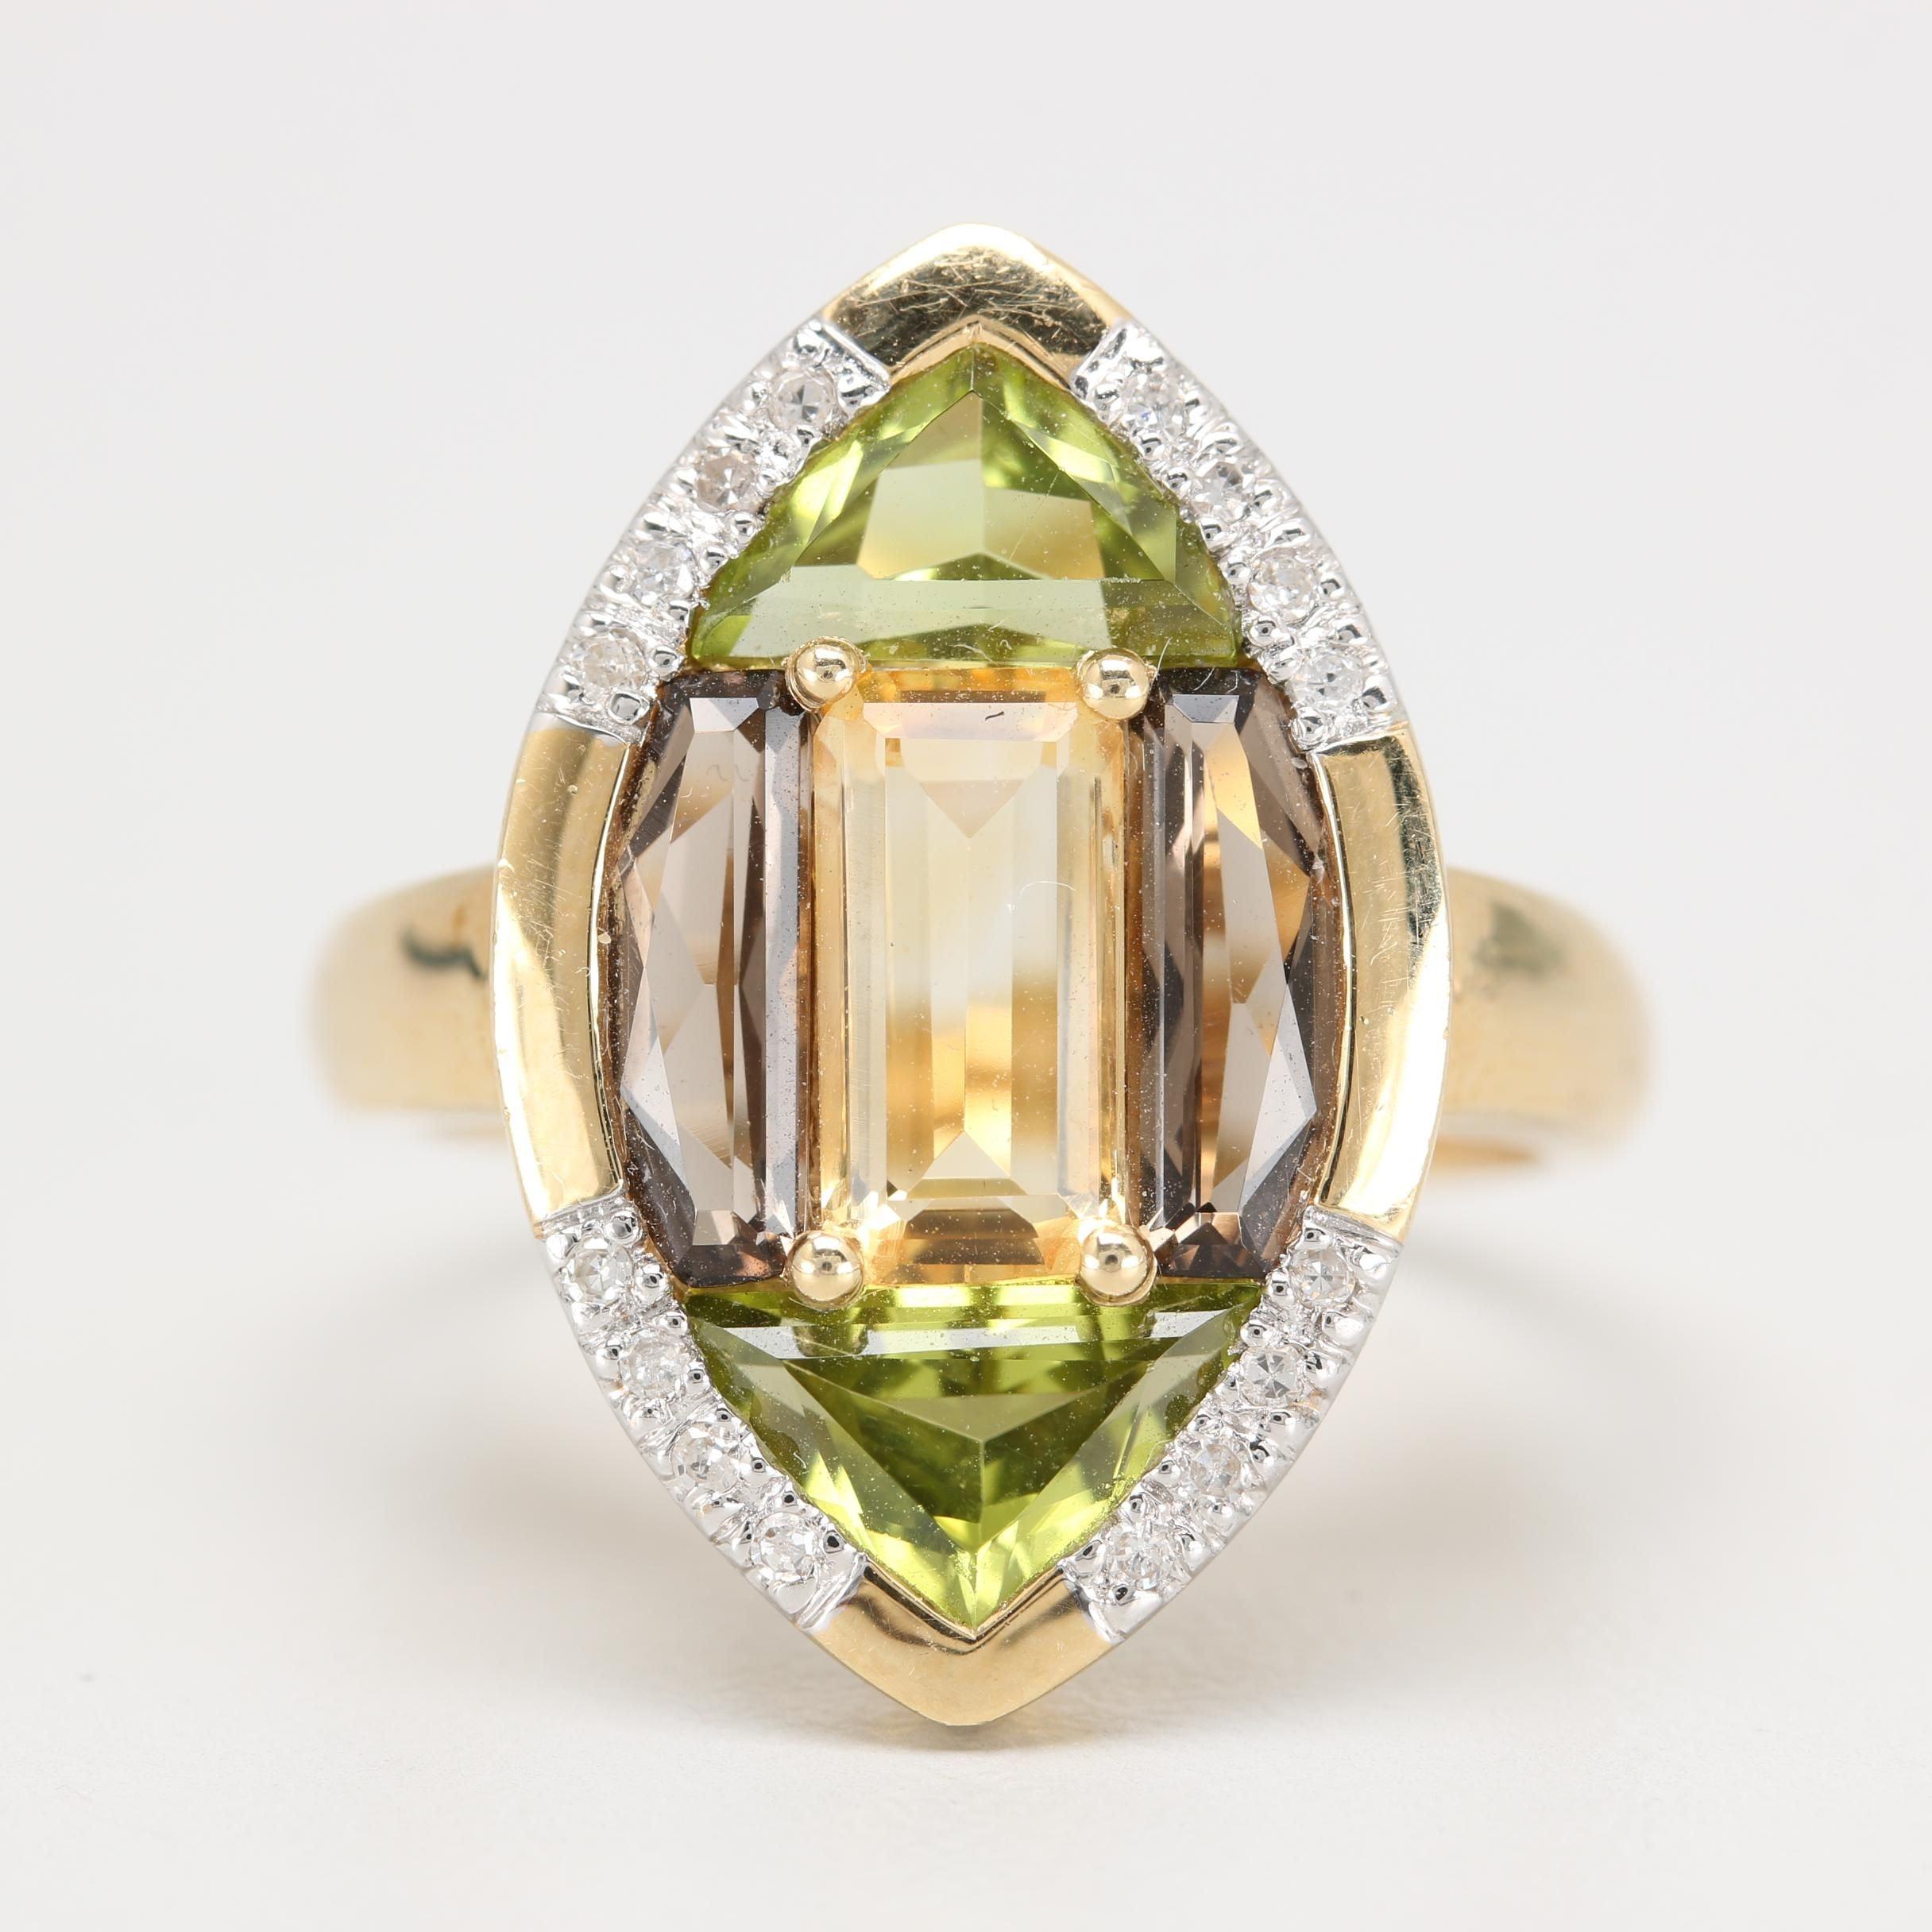 14K Yellow Gold Citrine, Smoky Quartz, Peridot, and Diamond Ring